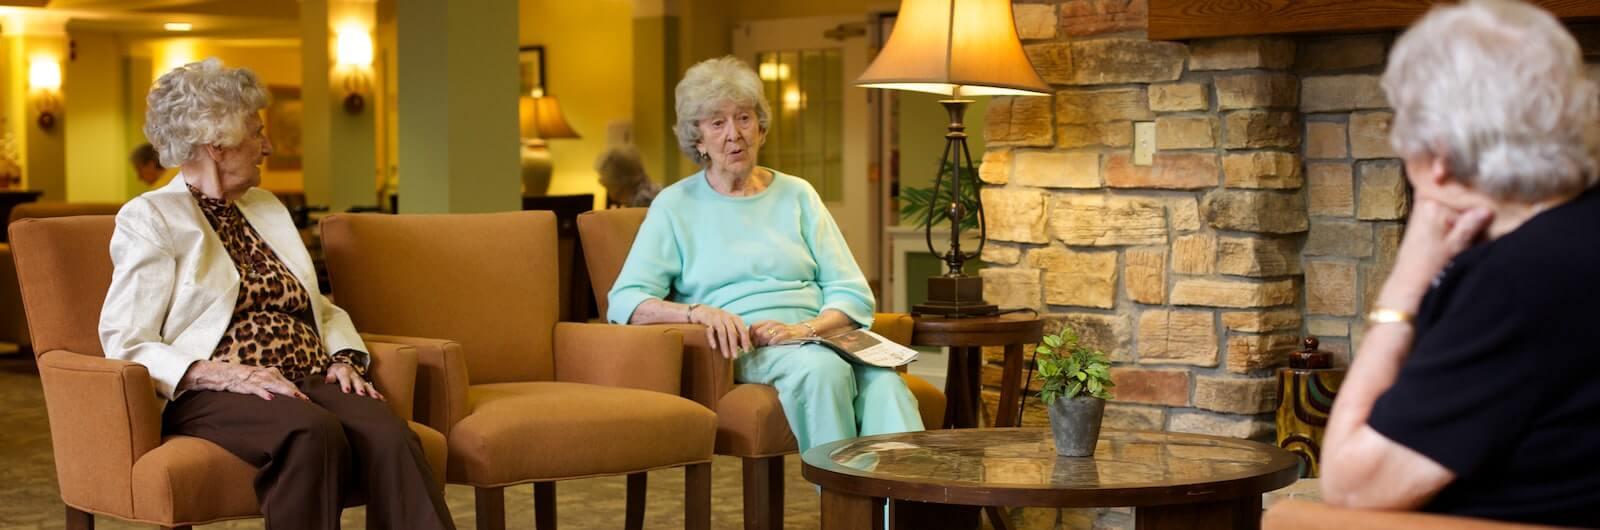 Elderly residents sitting in lounge